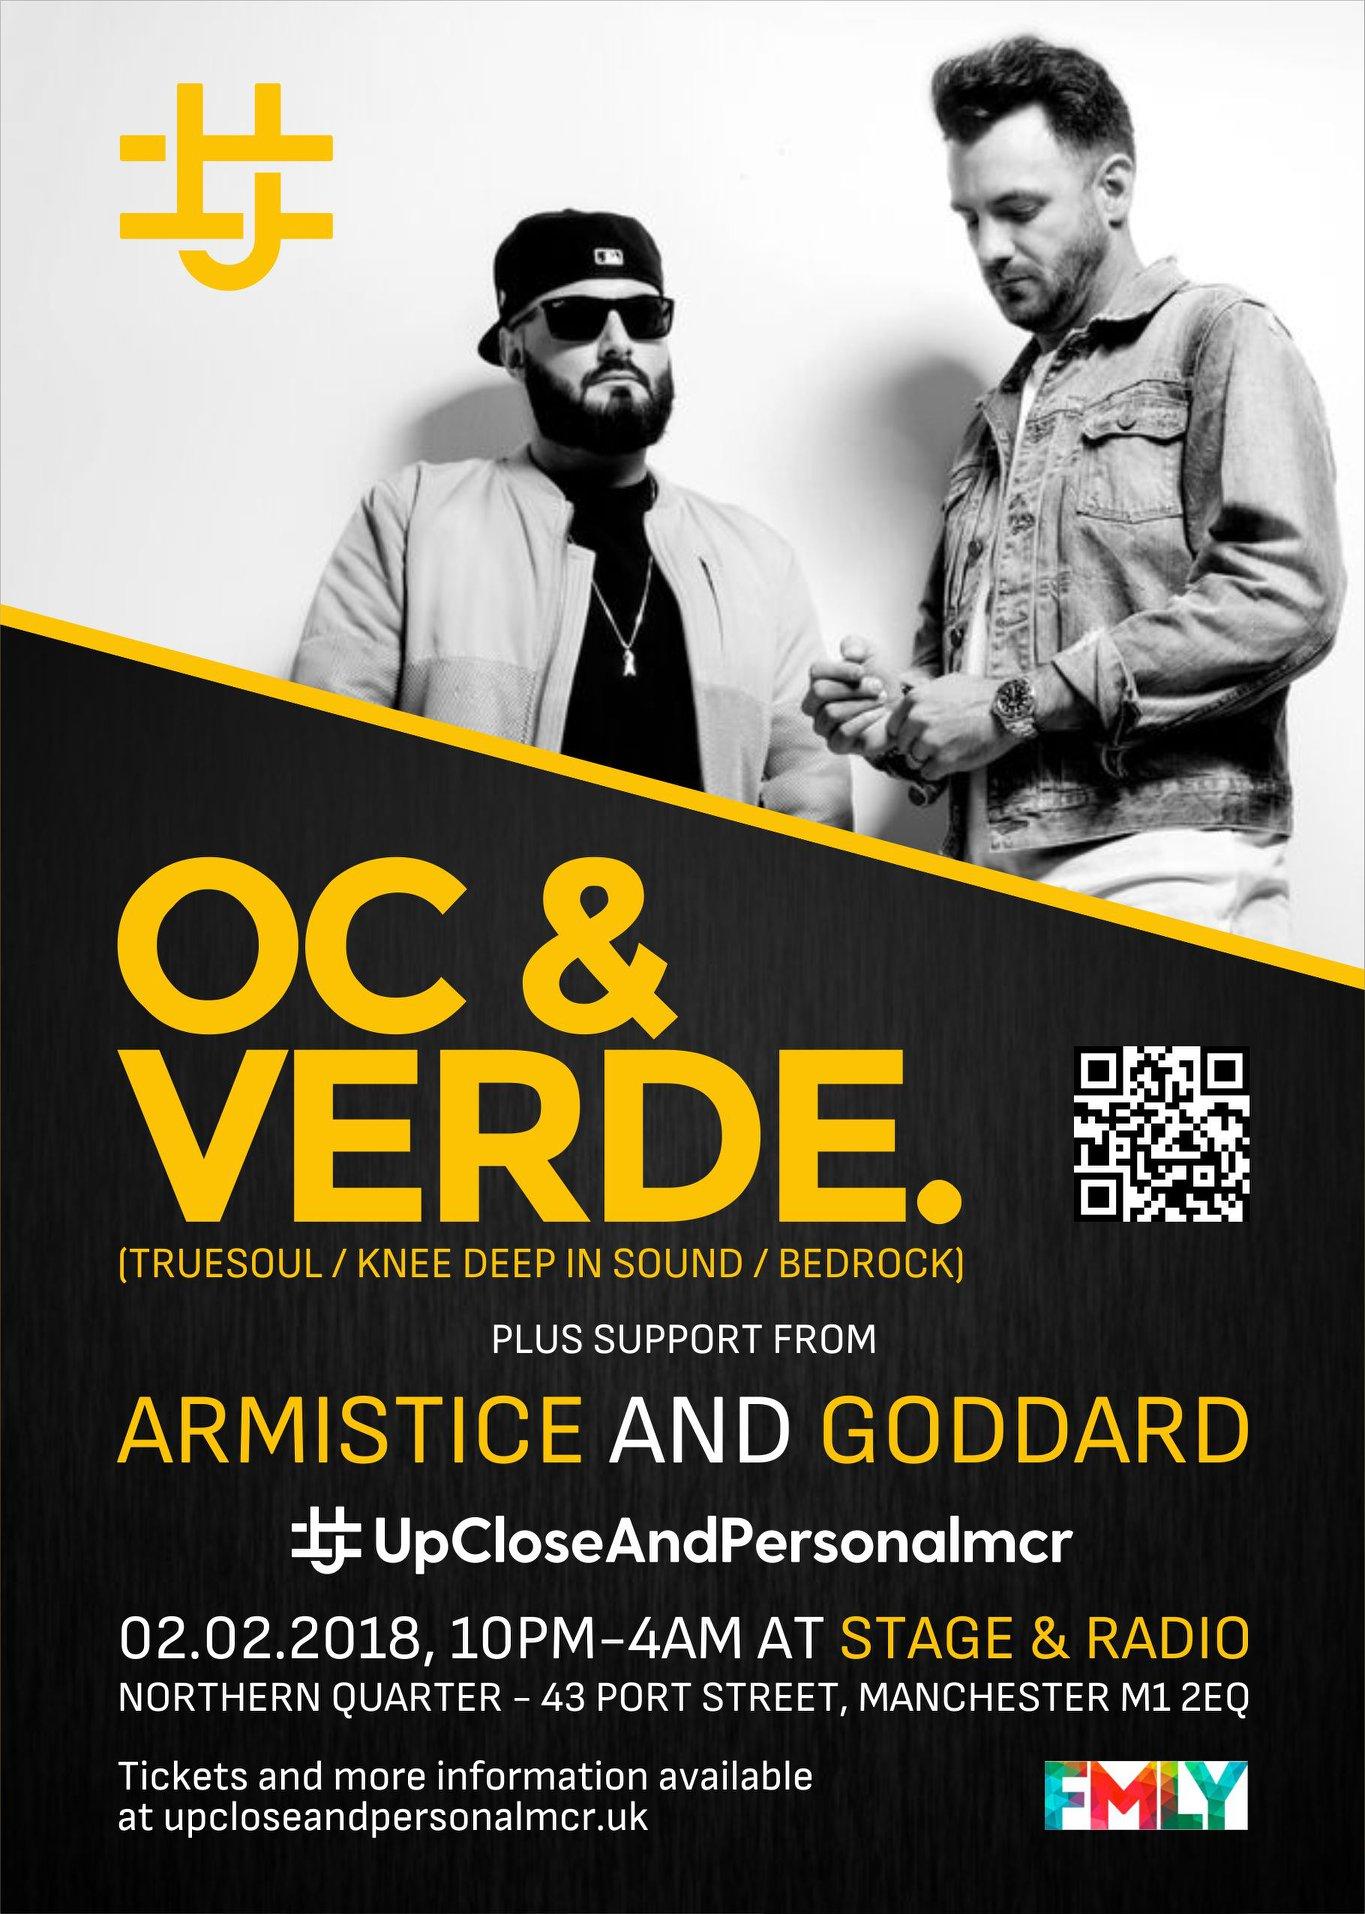 OC & Verde – Upcloseandpersonalmcr Review